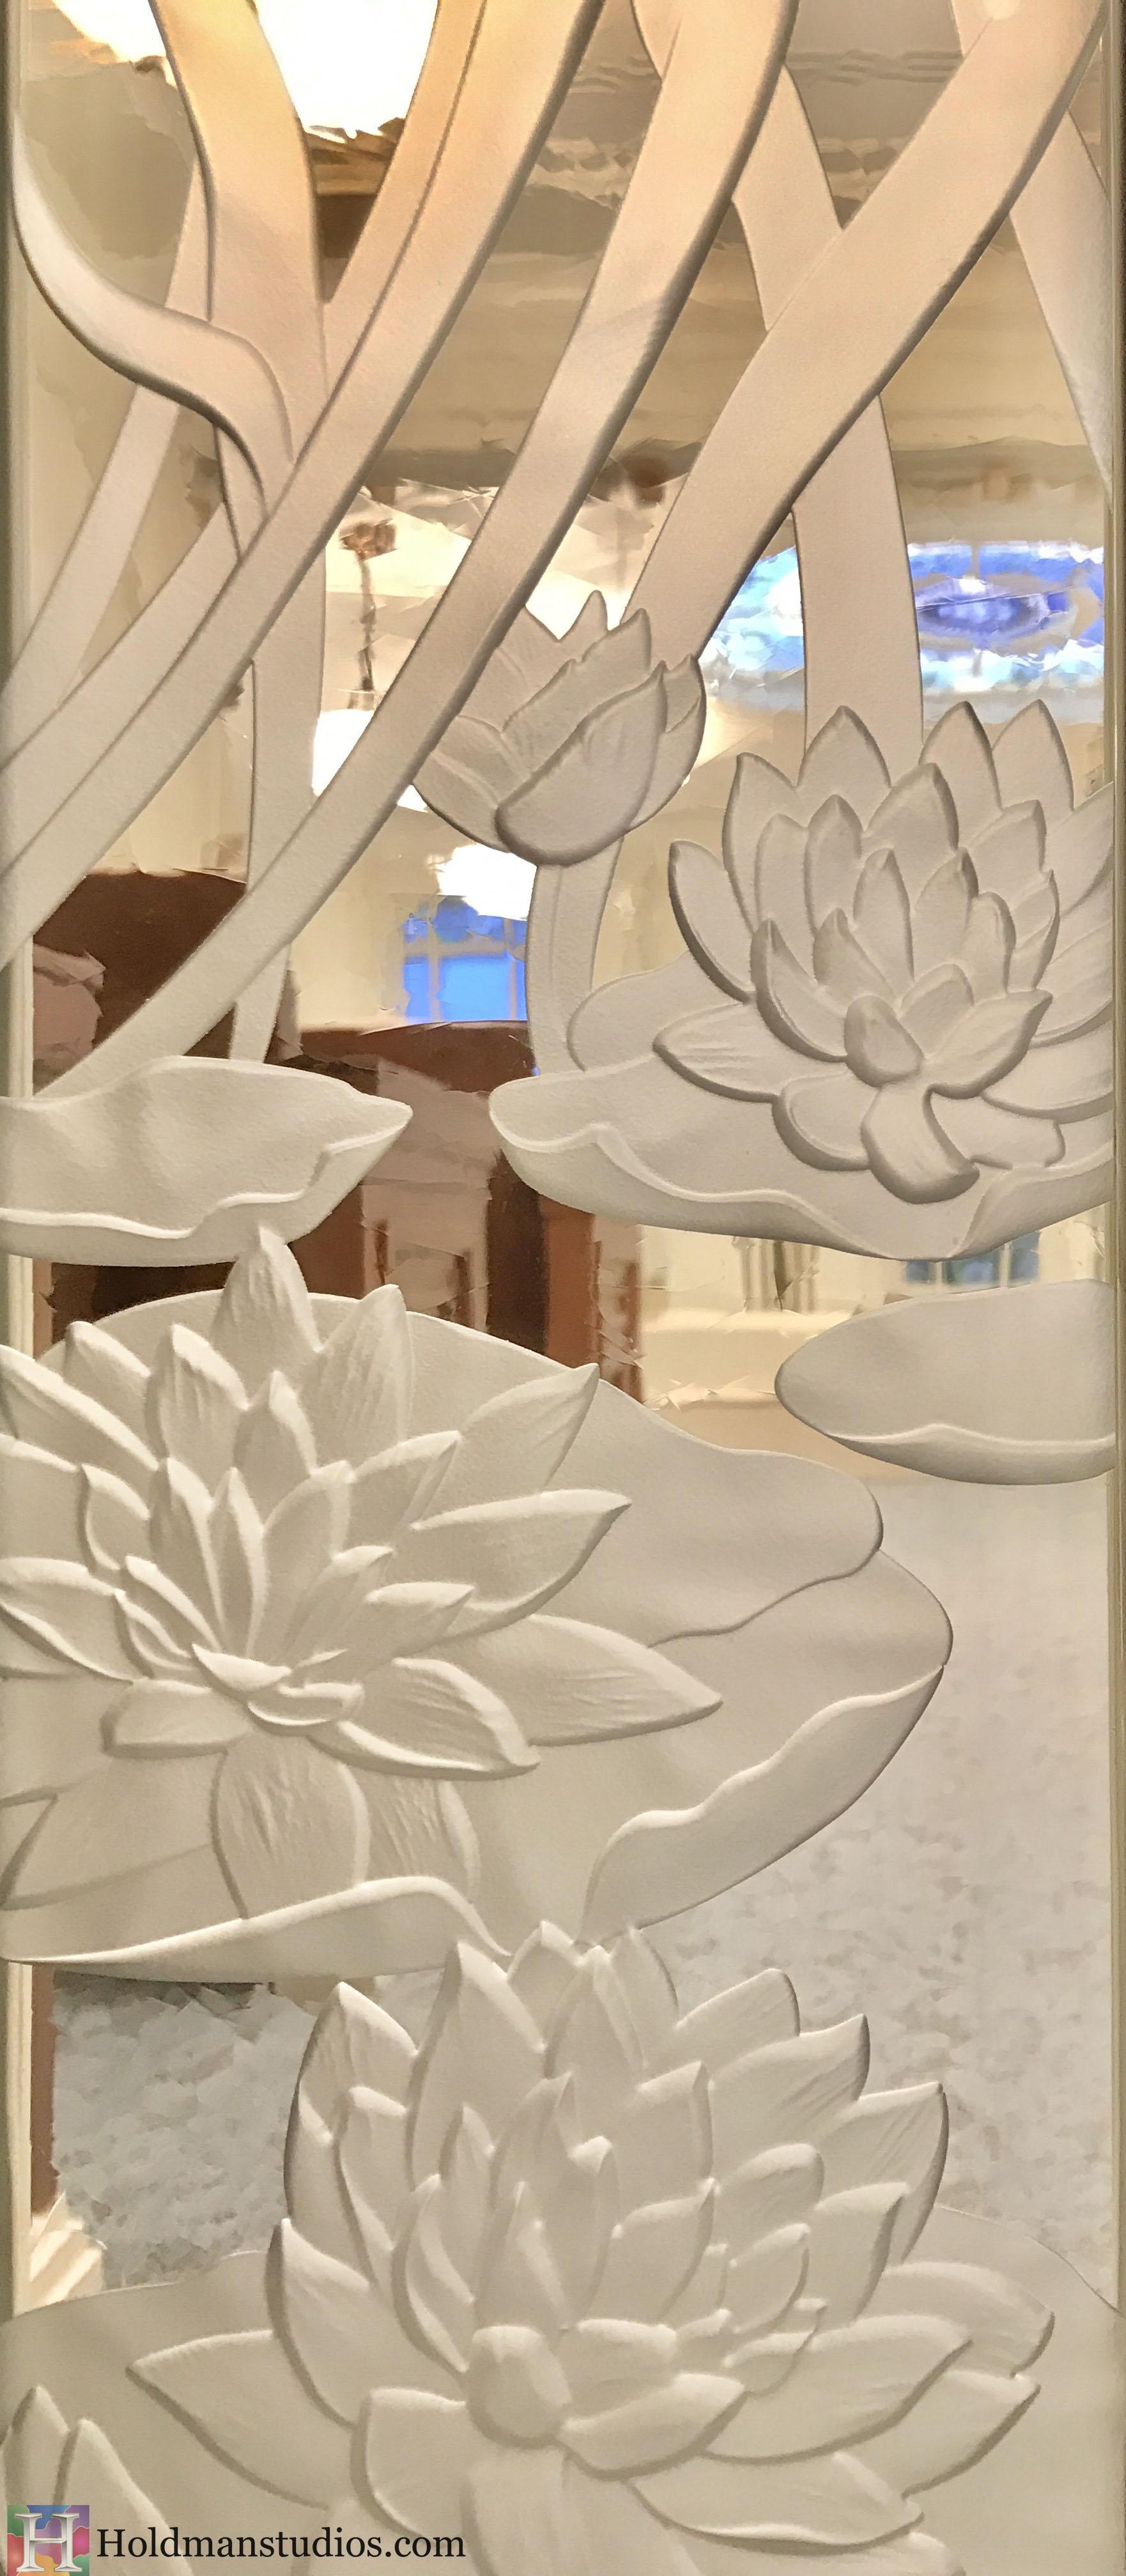 Holdman-Studios-Etched-Glass-Paris-LDS-Temple-Water-Lily-Pad-Flowers-Window-Crop.jpg